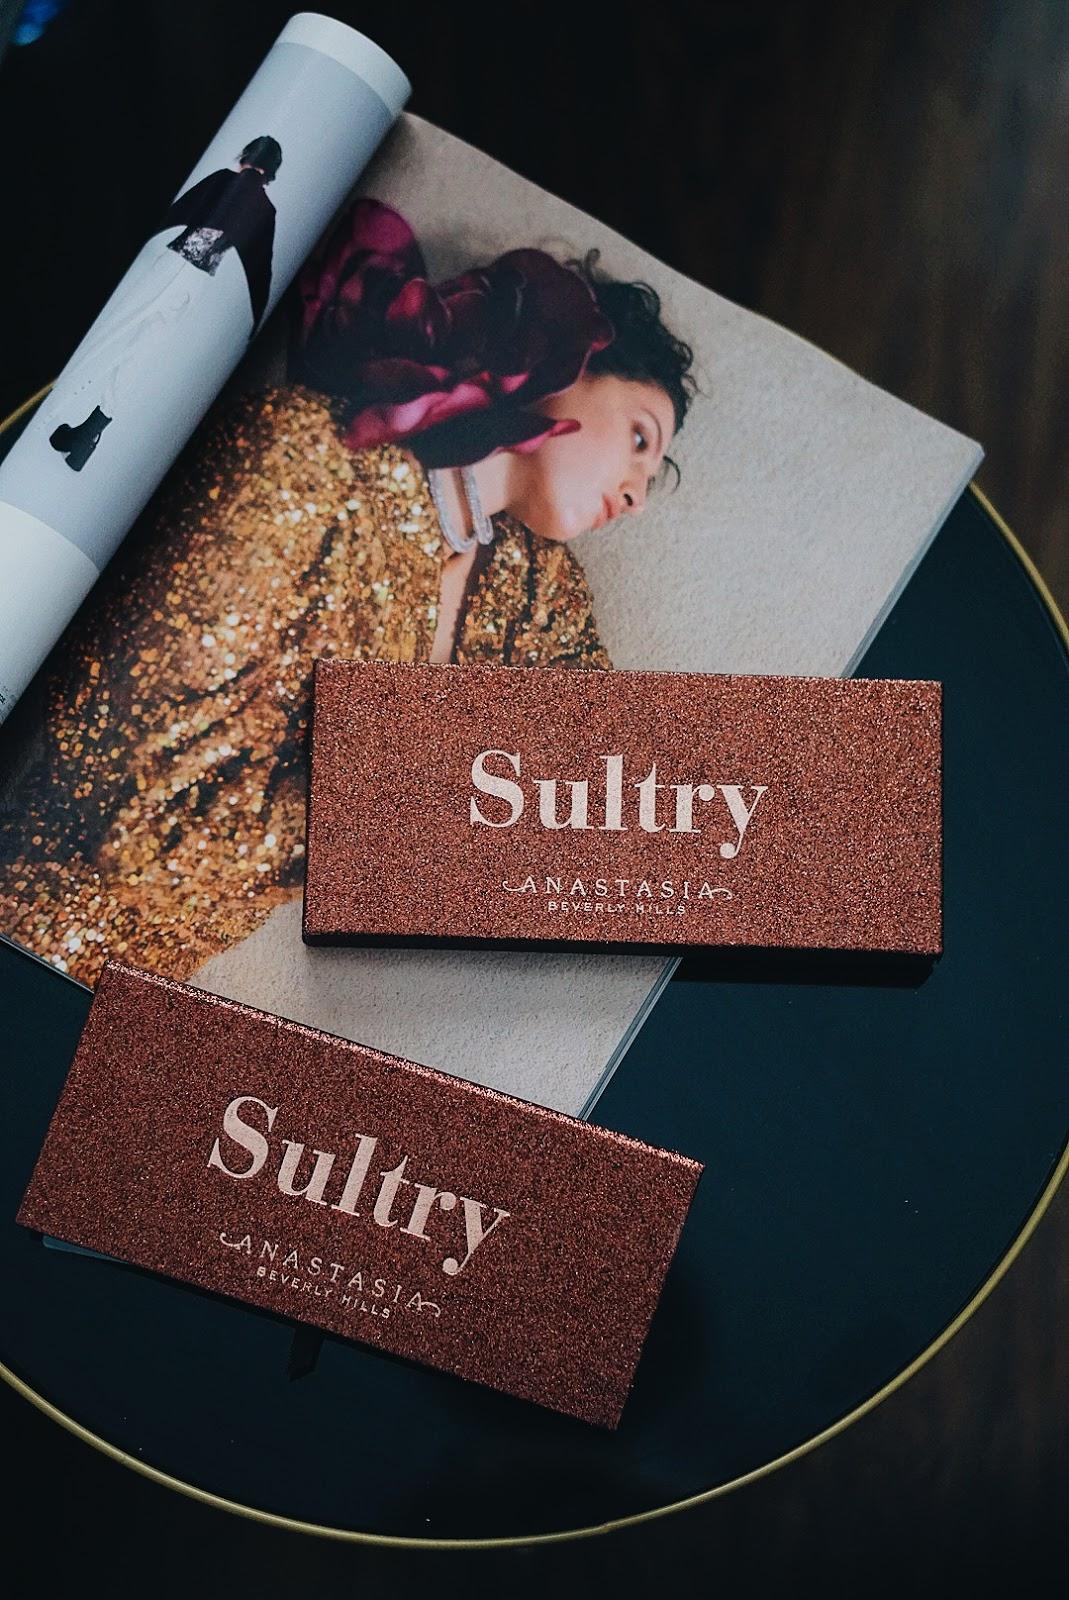 SULTRY - ANASTASIA BERVERLY HILLS  sephora promocja kod